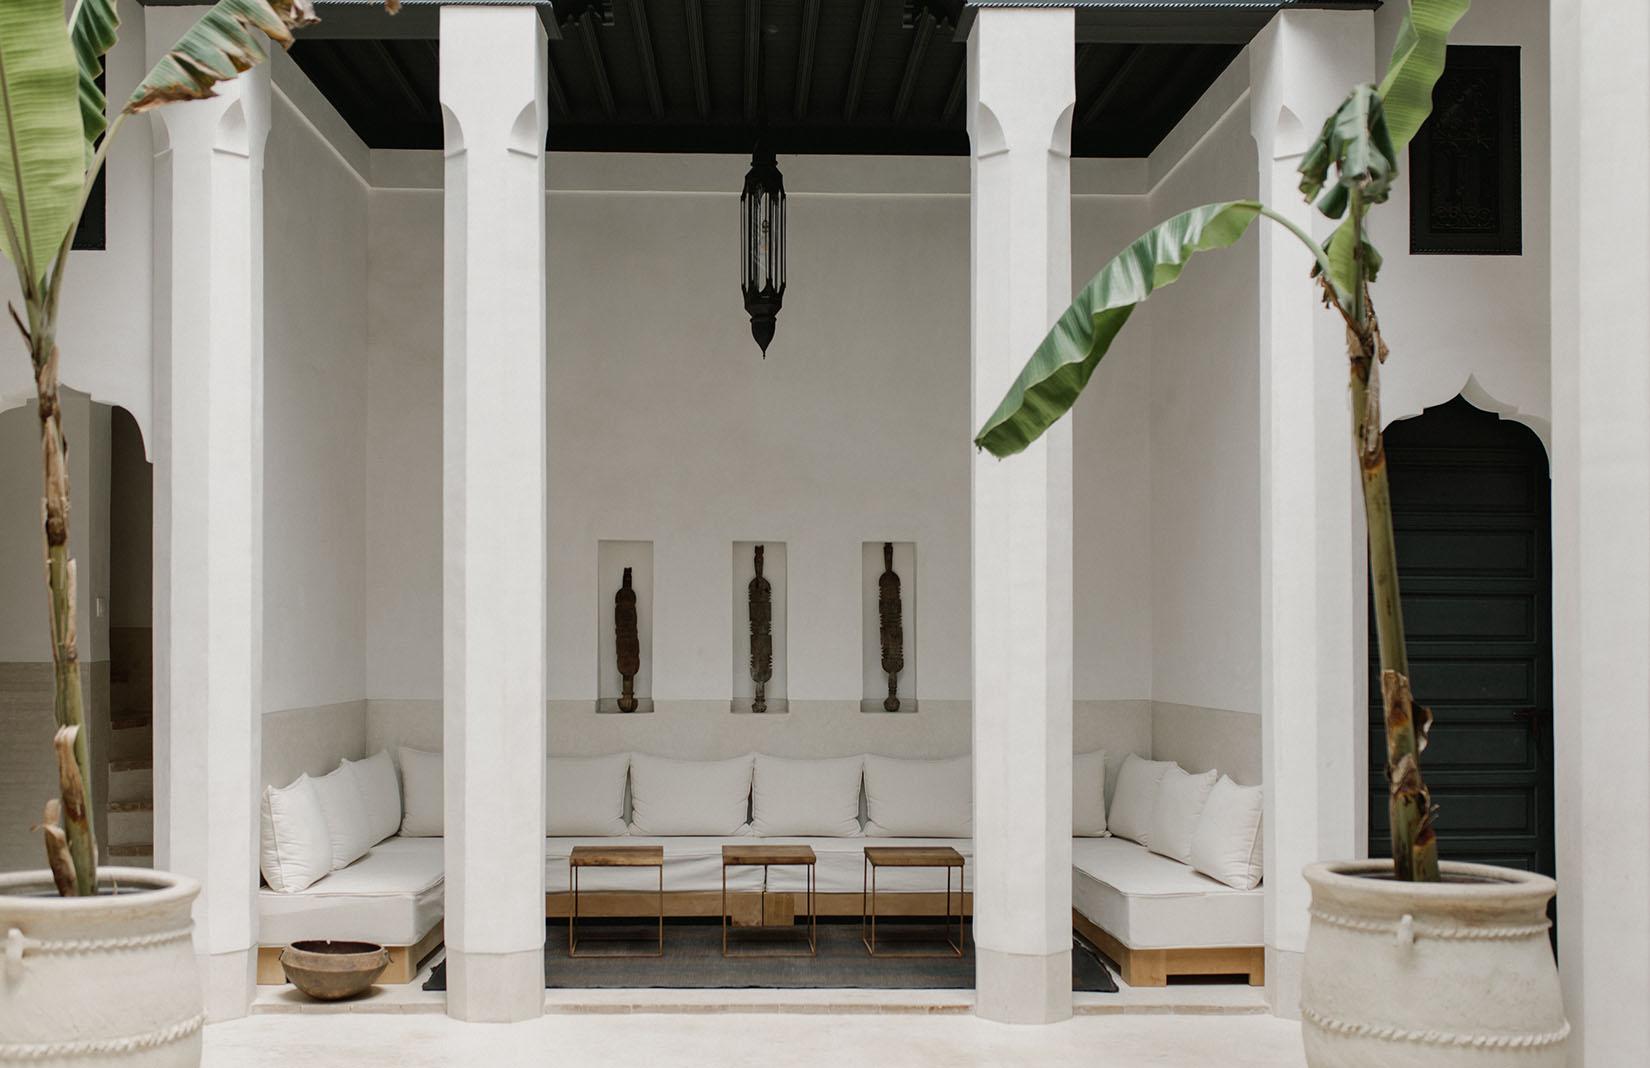 Holiday home of the week: a minimalist riad in Marrakech's Medina: Riad 42